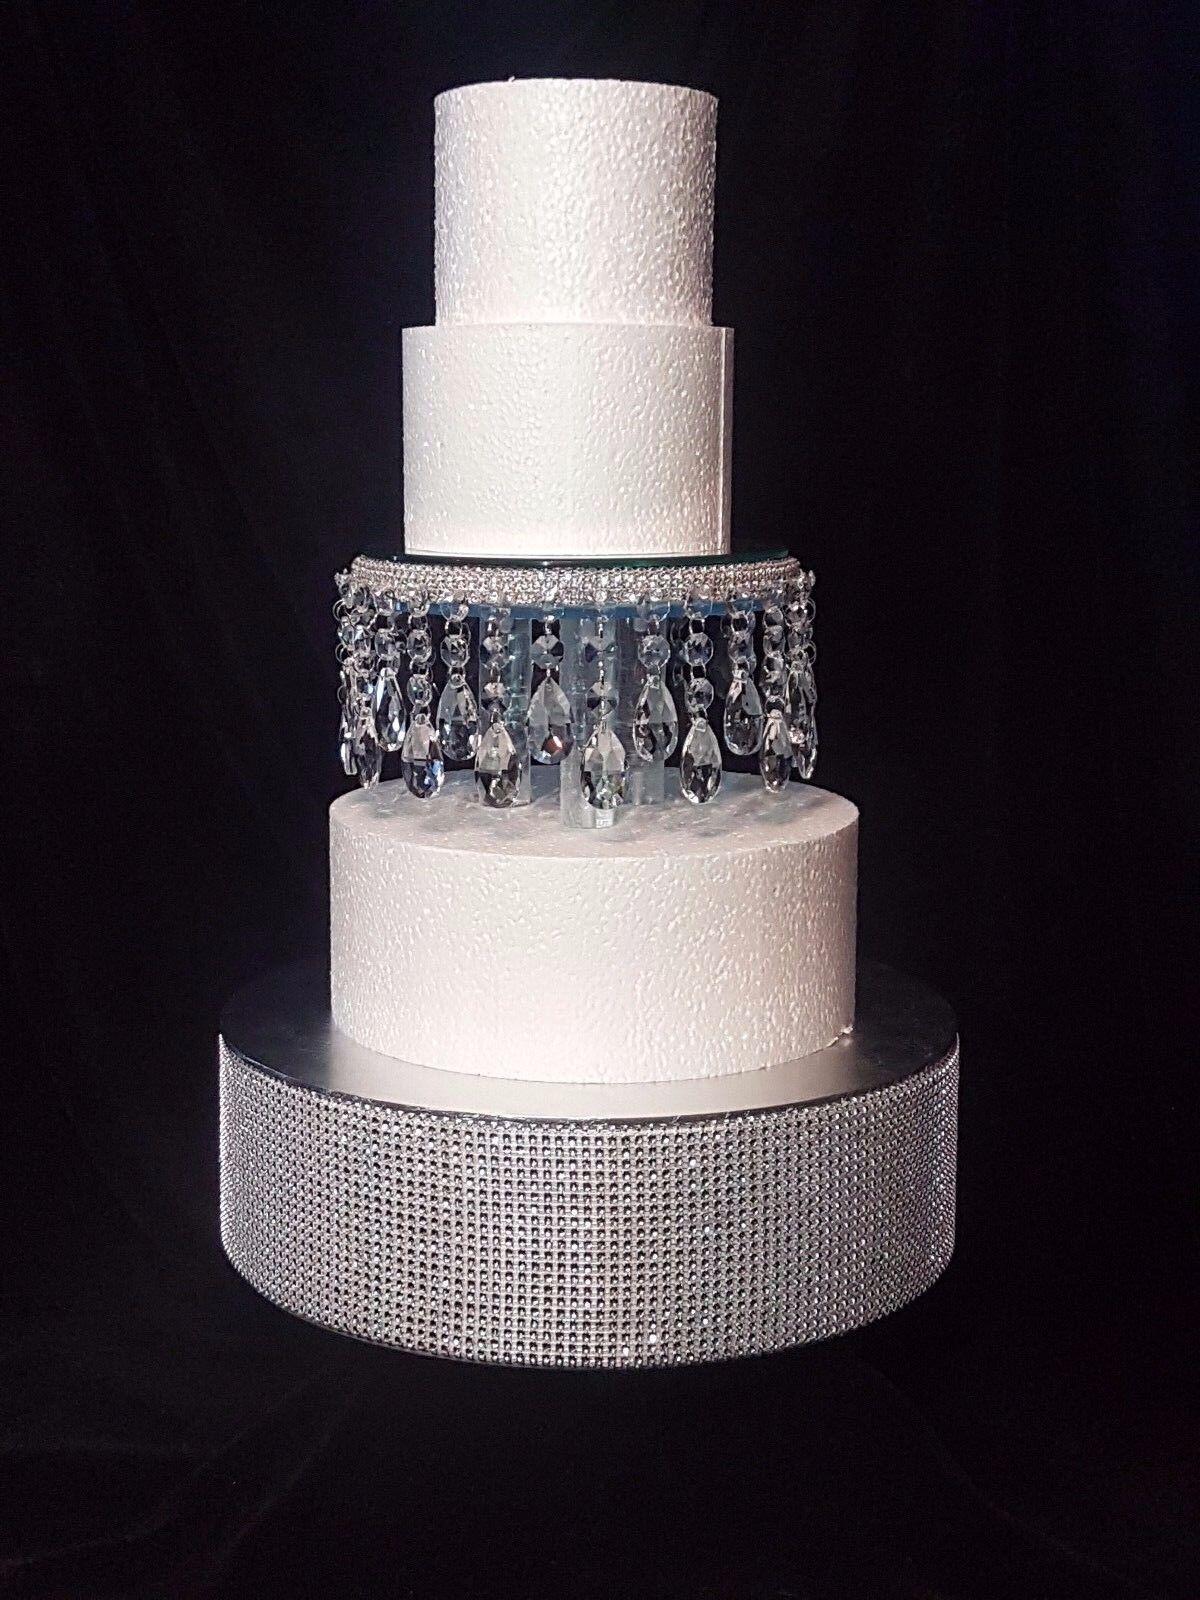 Crystal droplet Cake Separator  6   8  10  diameters - scroll to see video clip